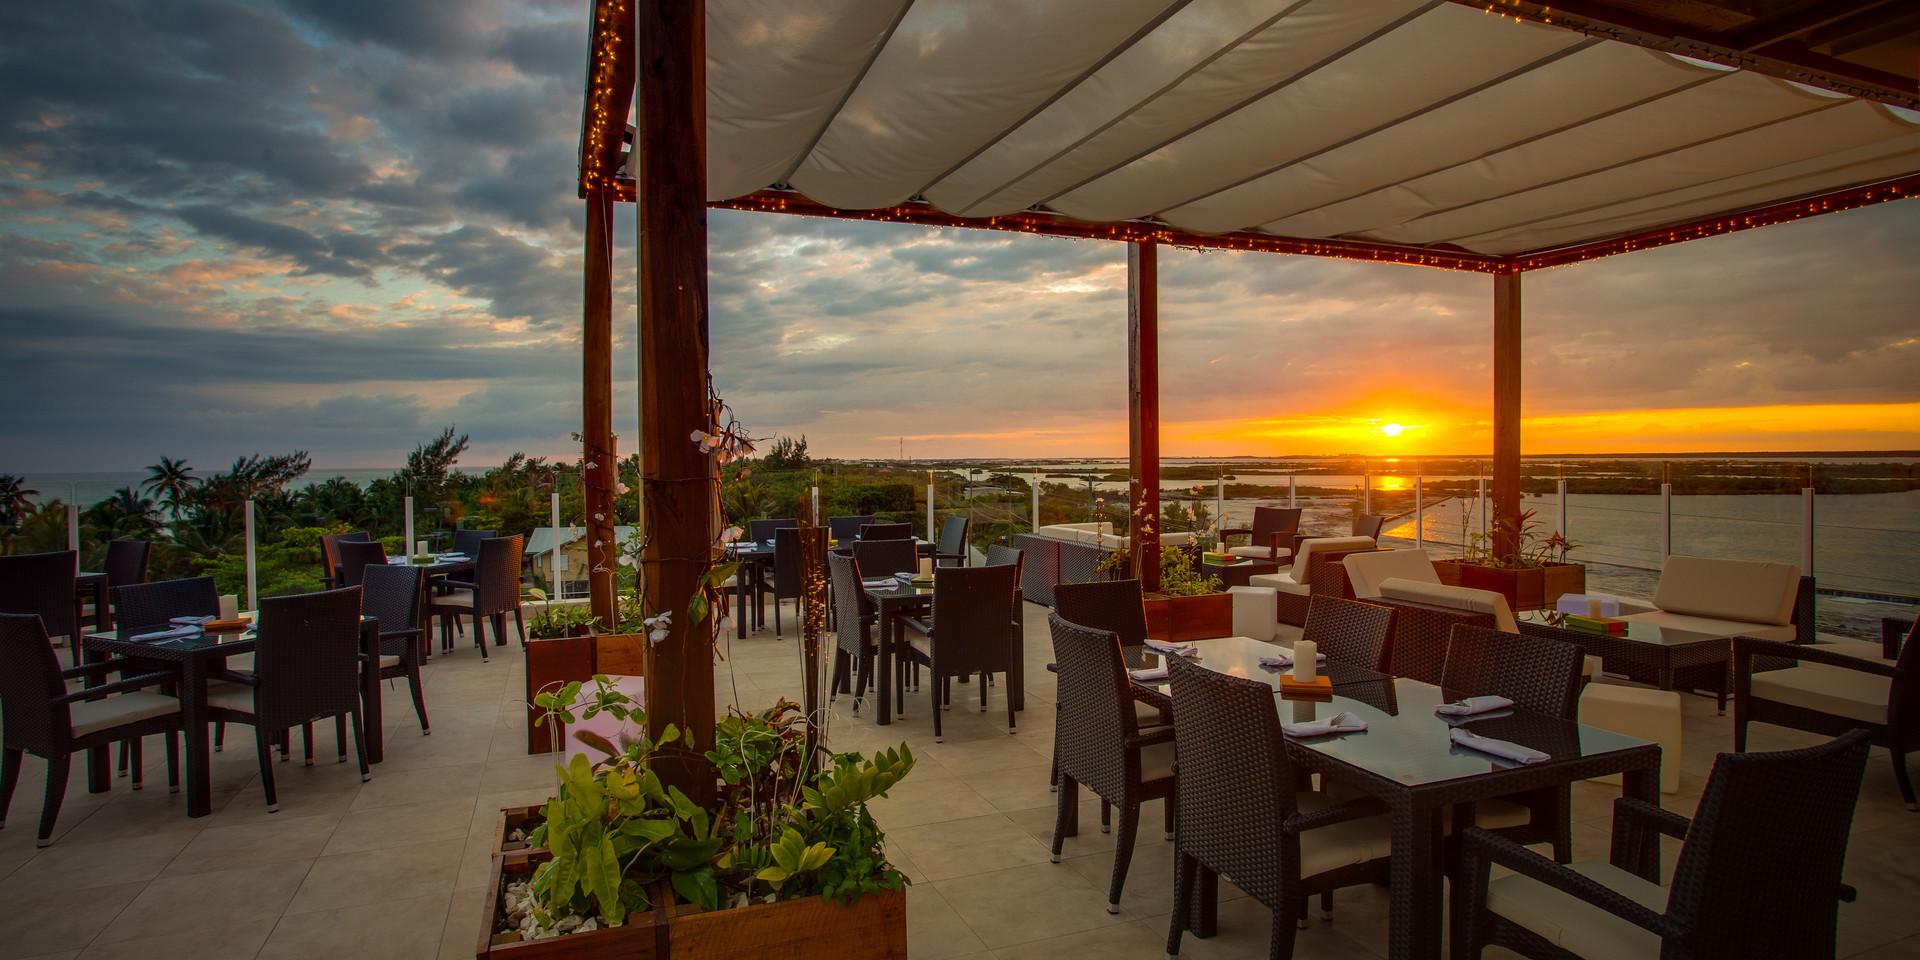 Sunset at RAIN restaurant.